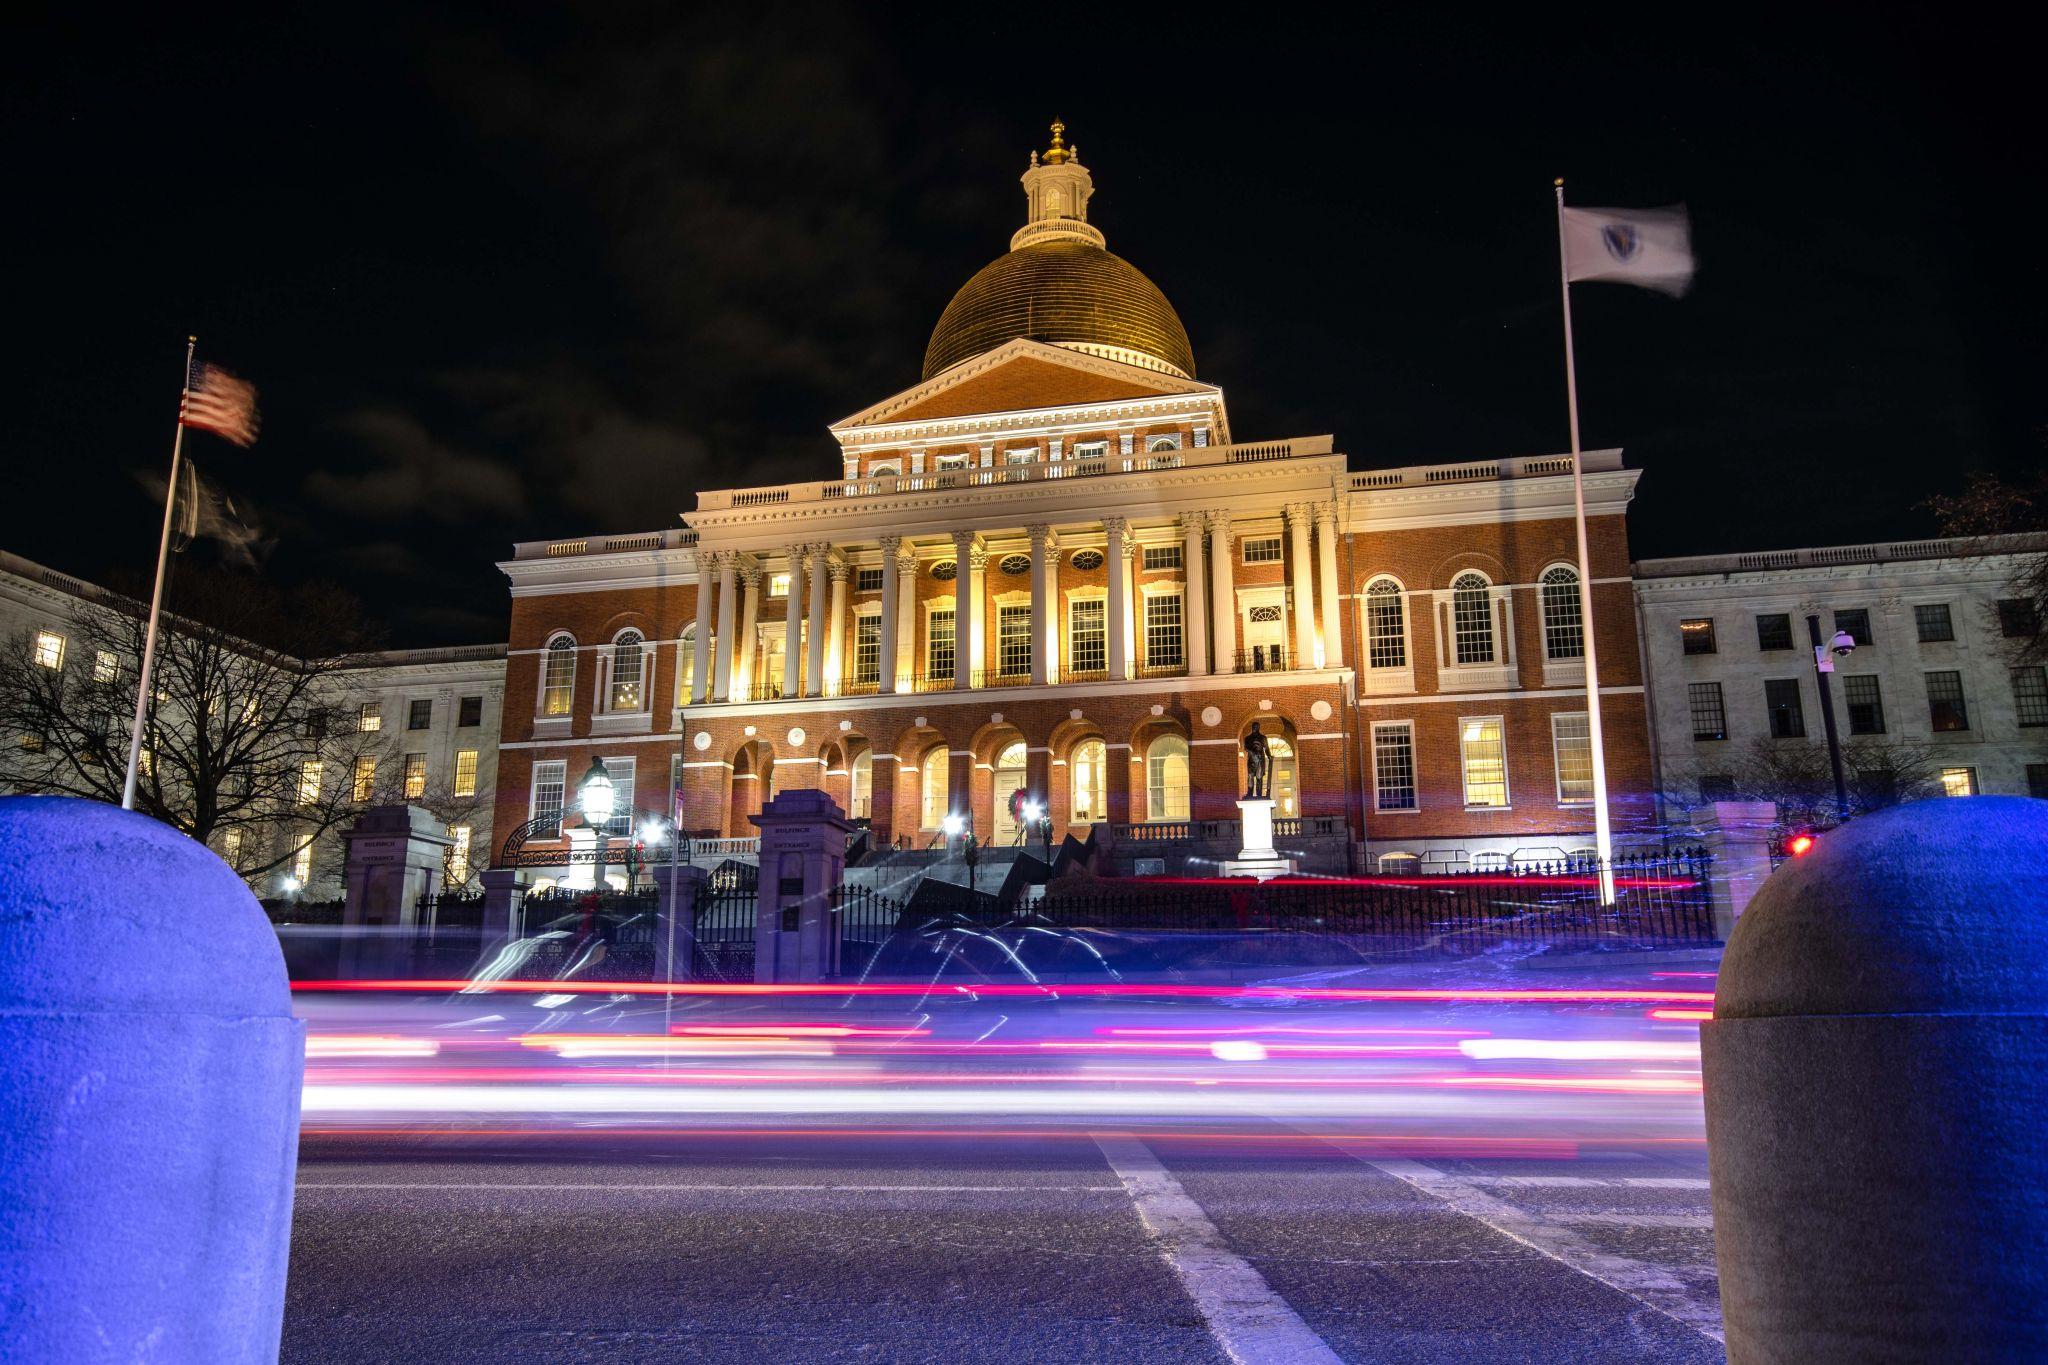 Massachusetts State House, USA